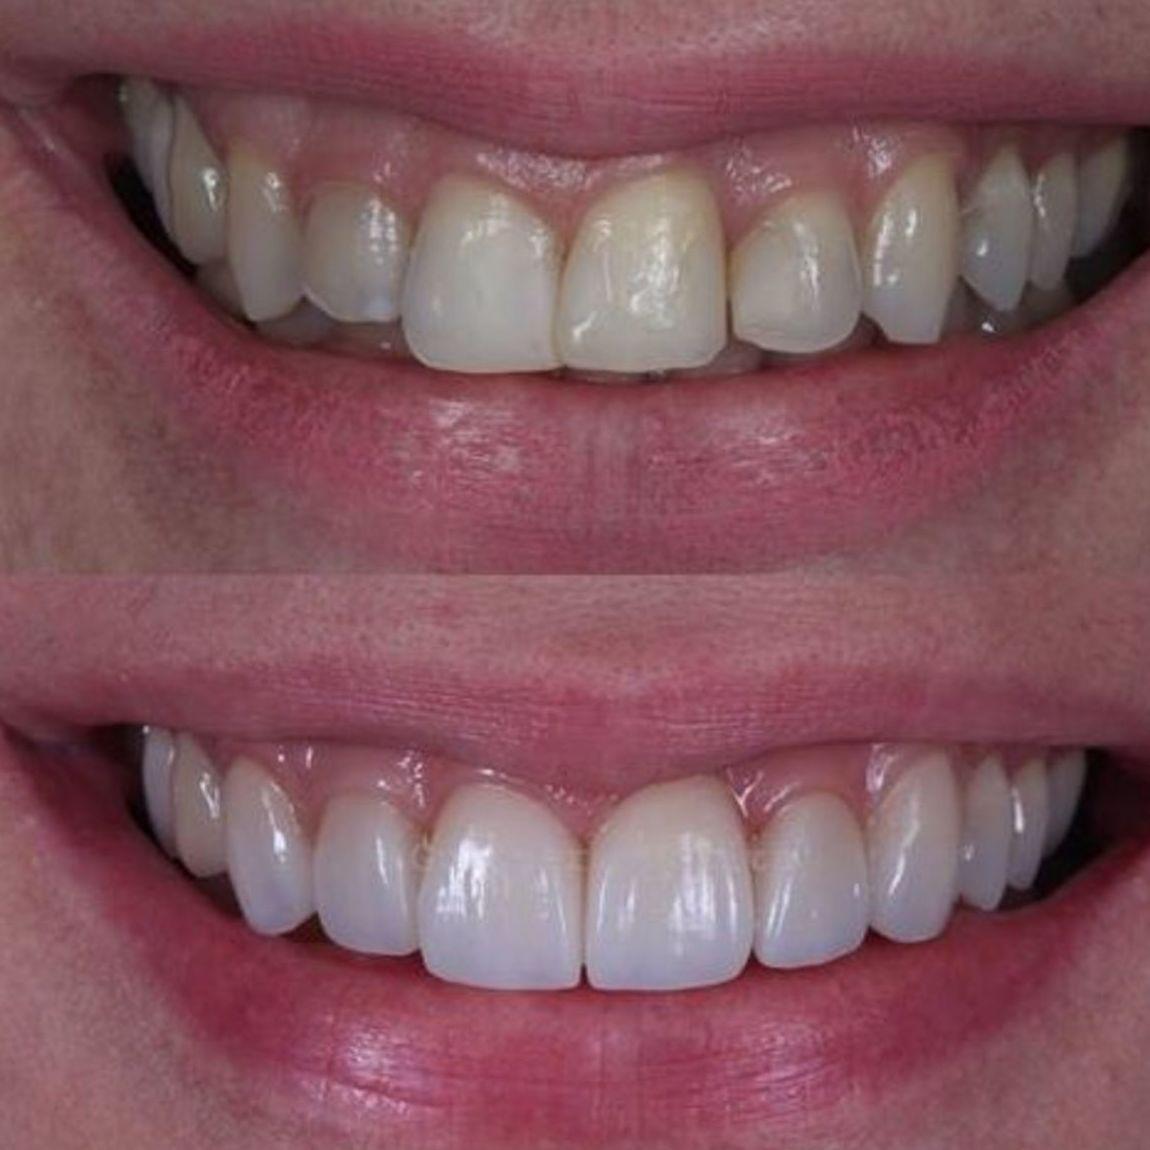 Blanqueamientos dentales en Eurodent